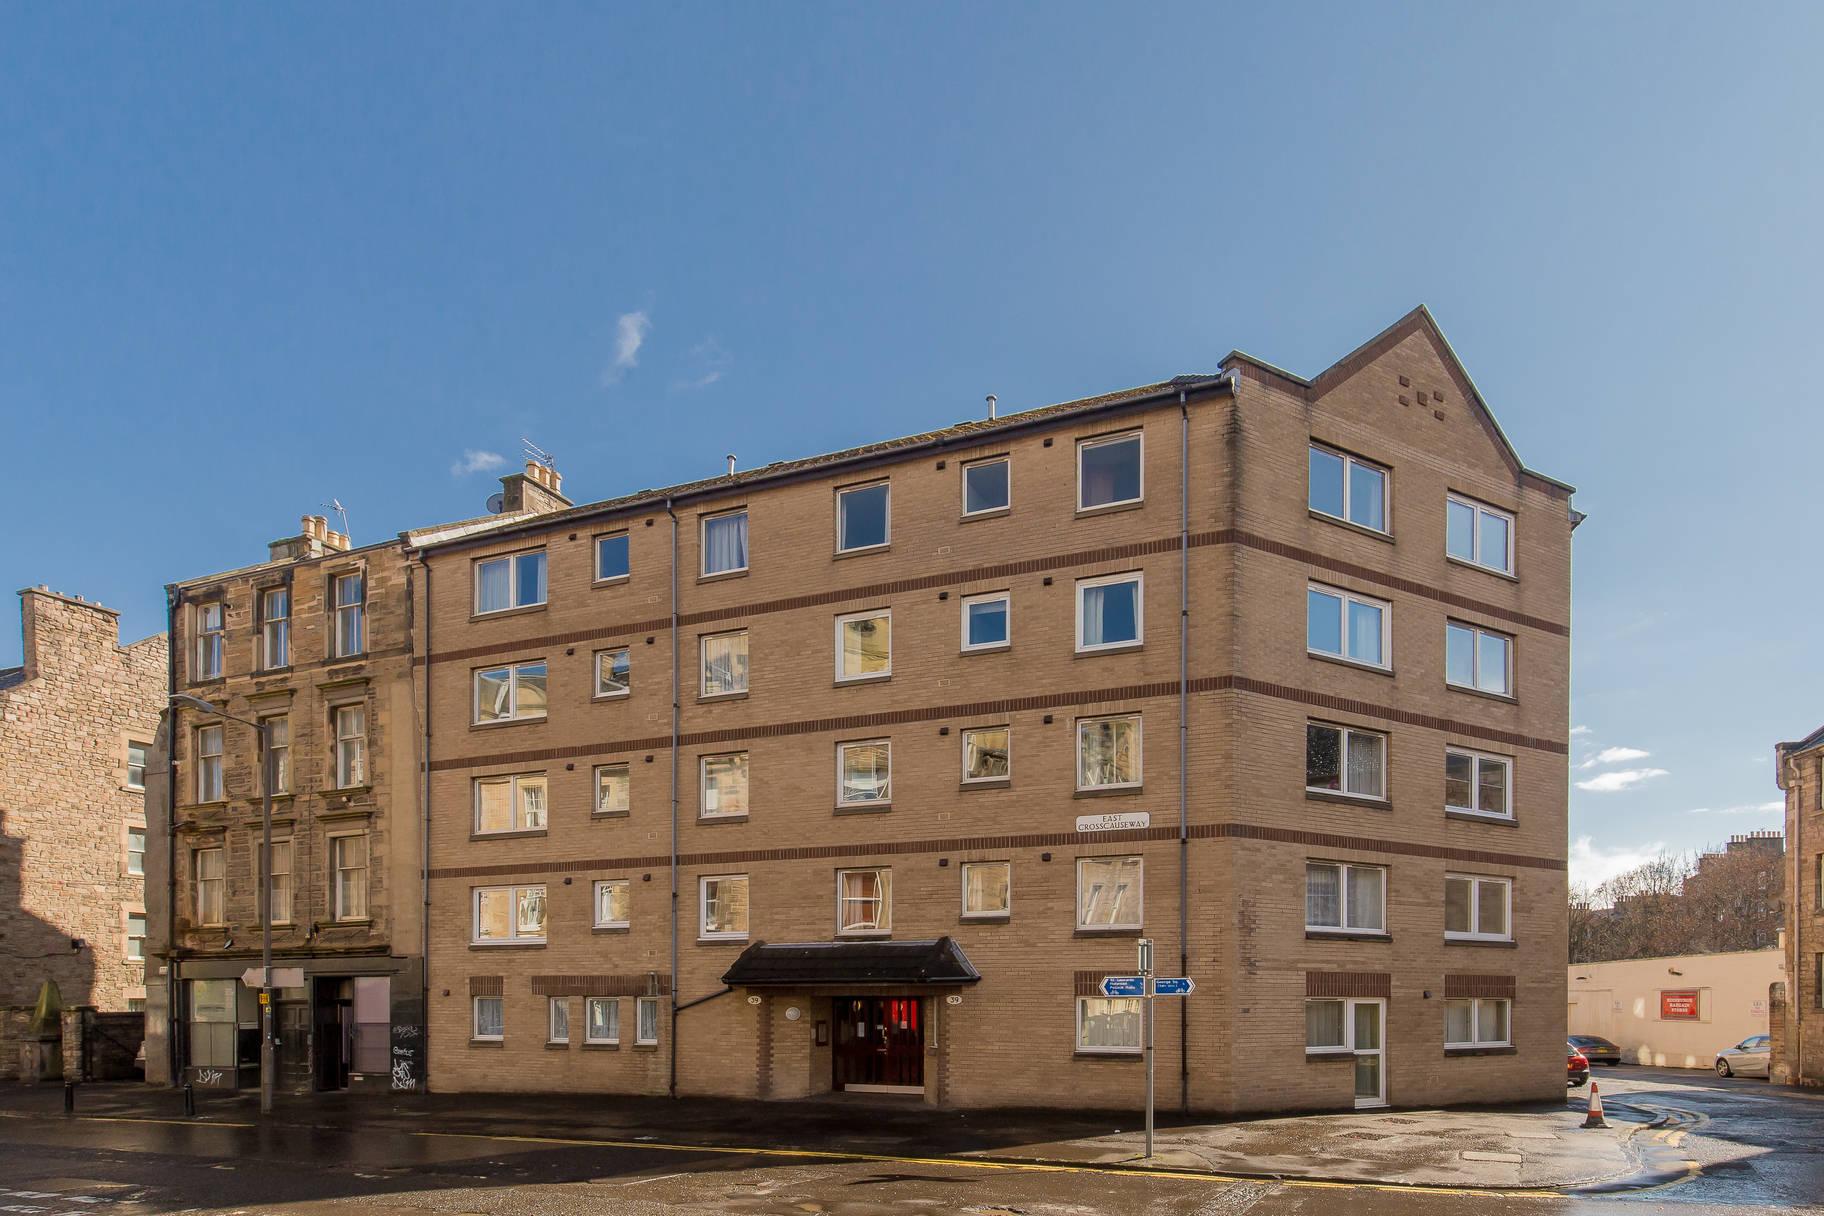 39/21 Homecrag House, East Crosscauseway, Edinburgh, EH8 9HG